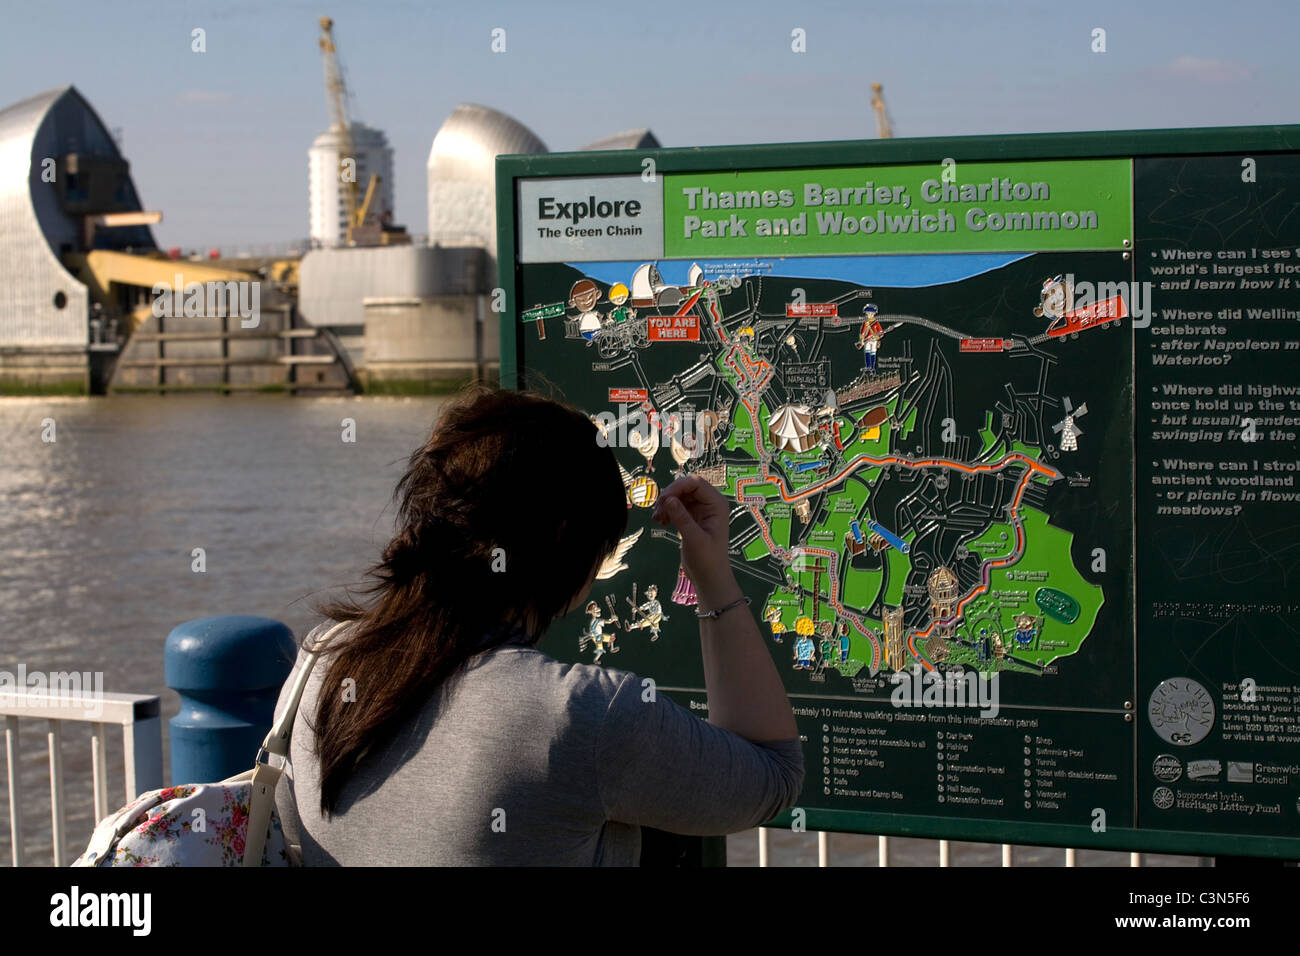 Thames Barrier Charlton London England - Stock Image